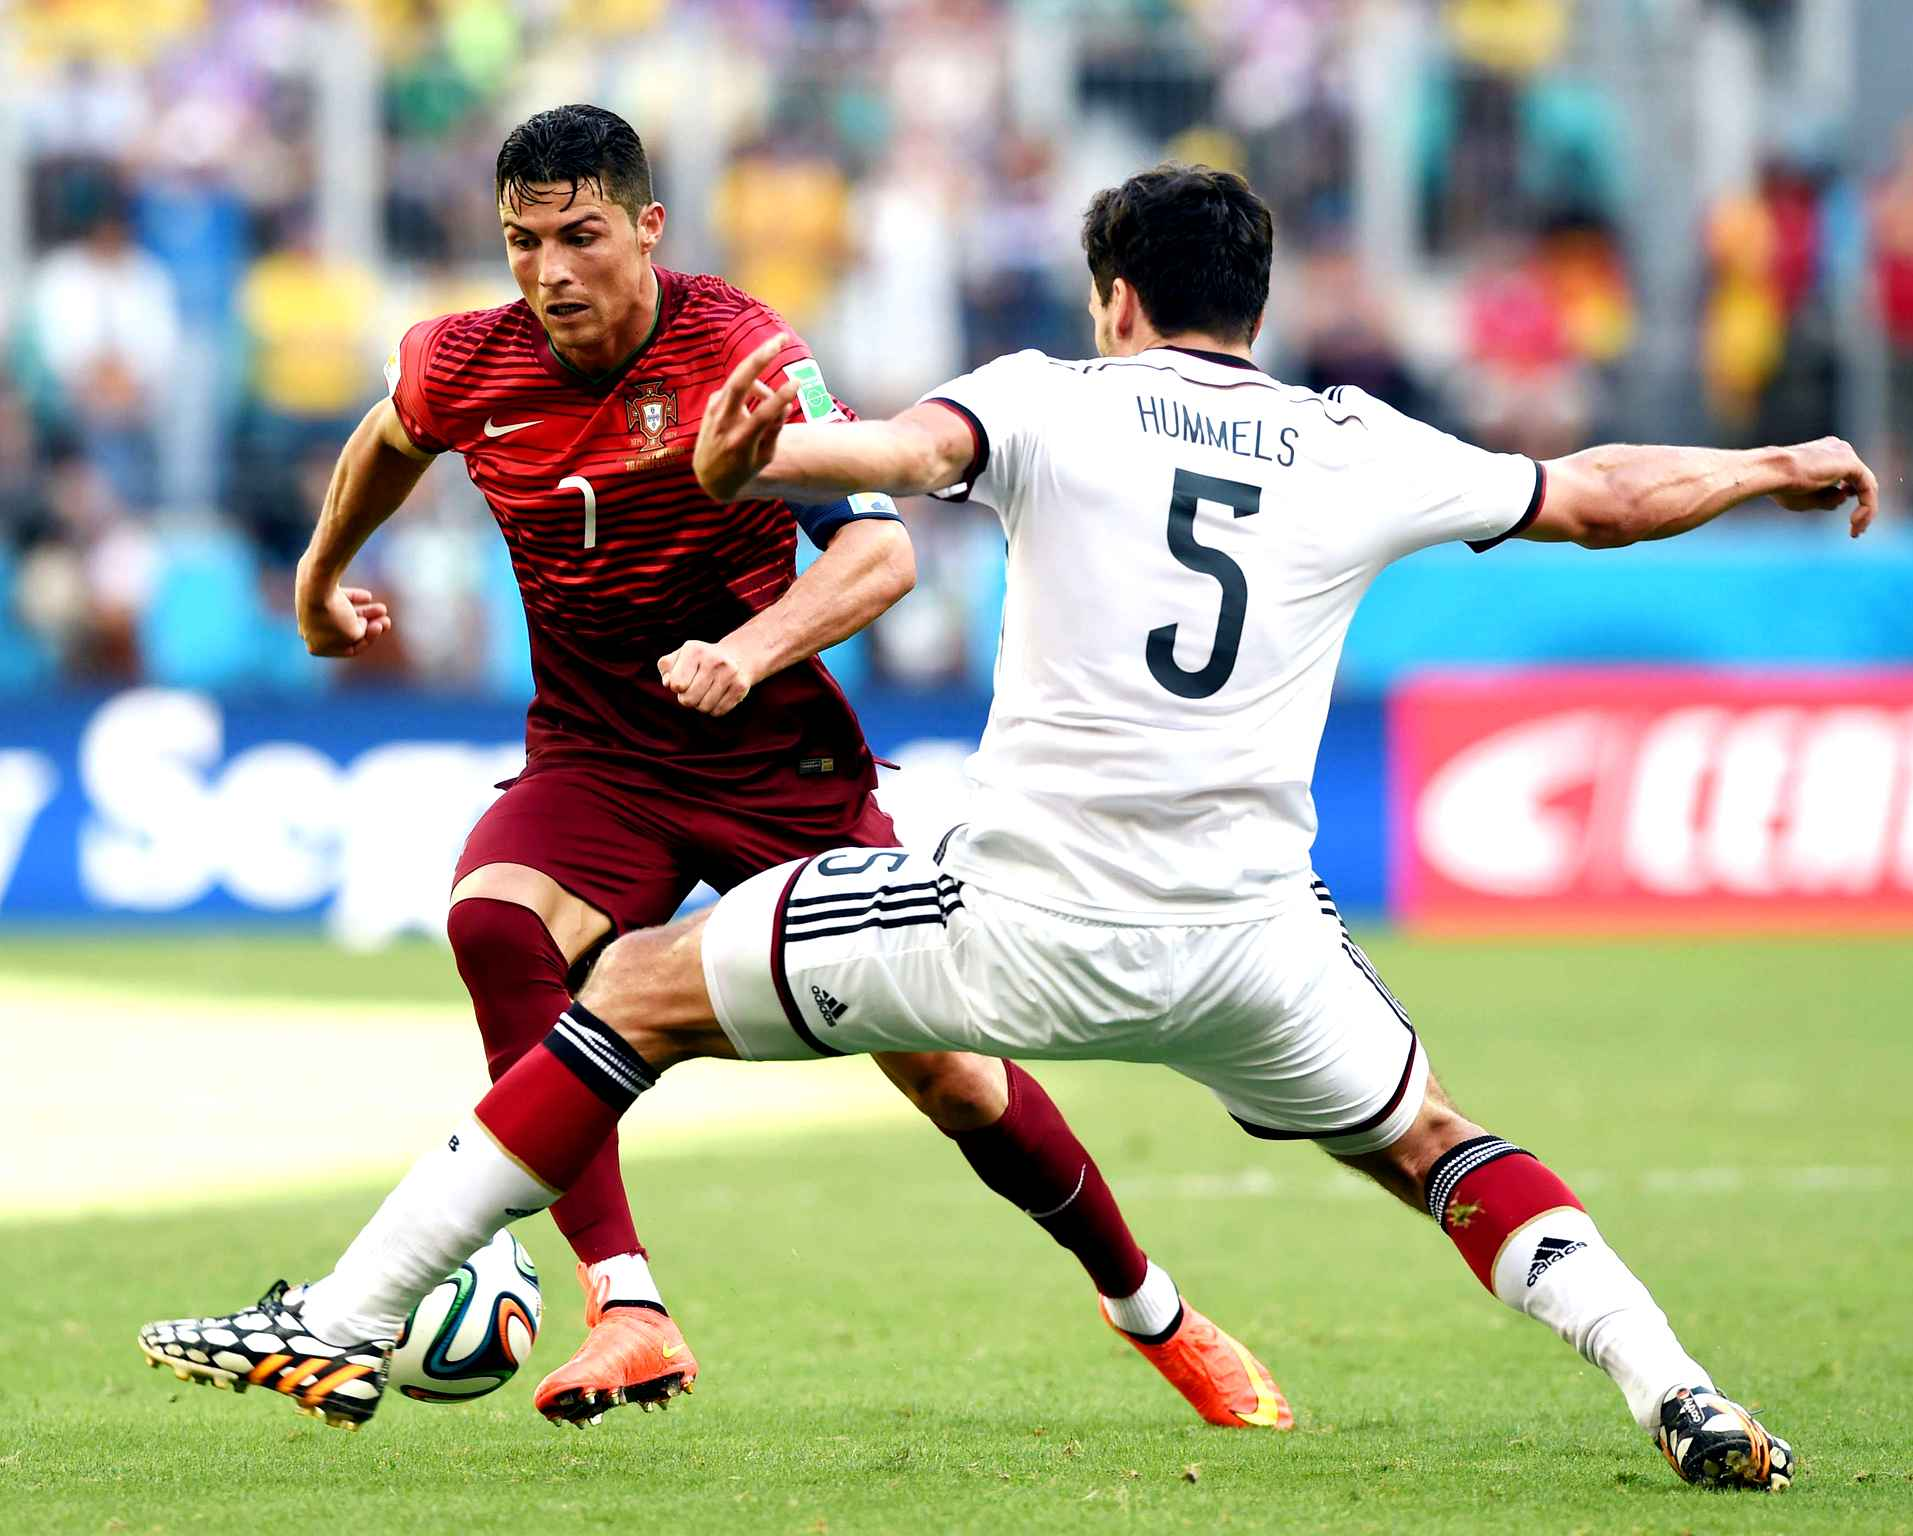 Chaussures-football-nike-mercurial-ronaldo-2014-juin-2018